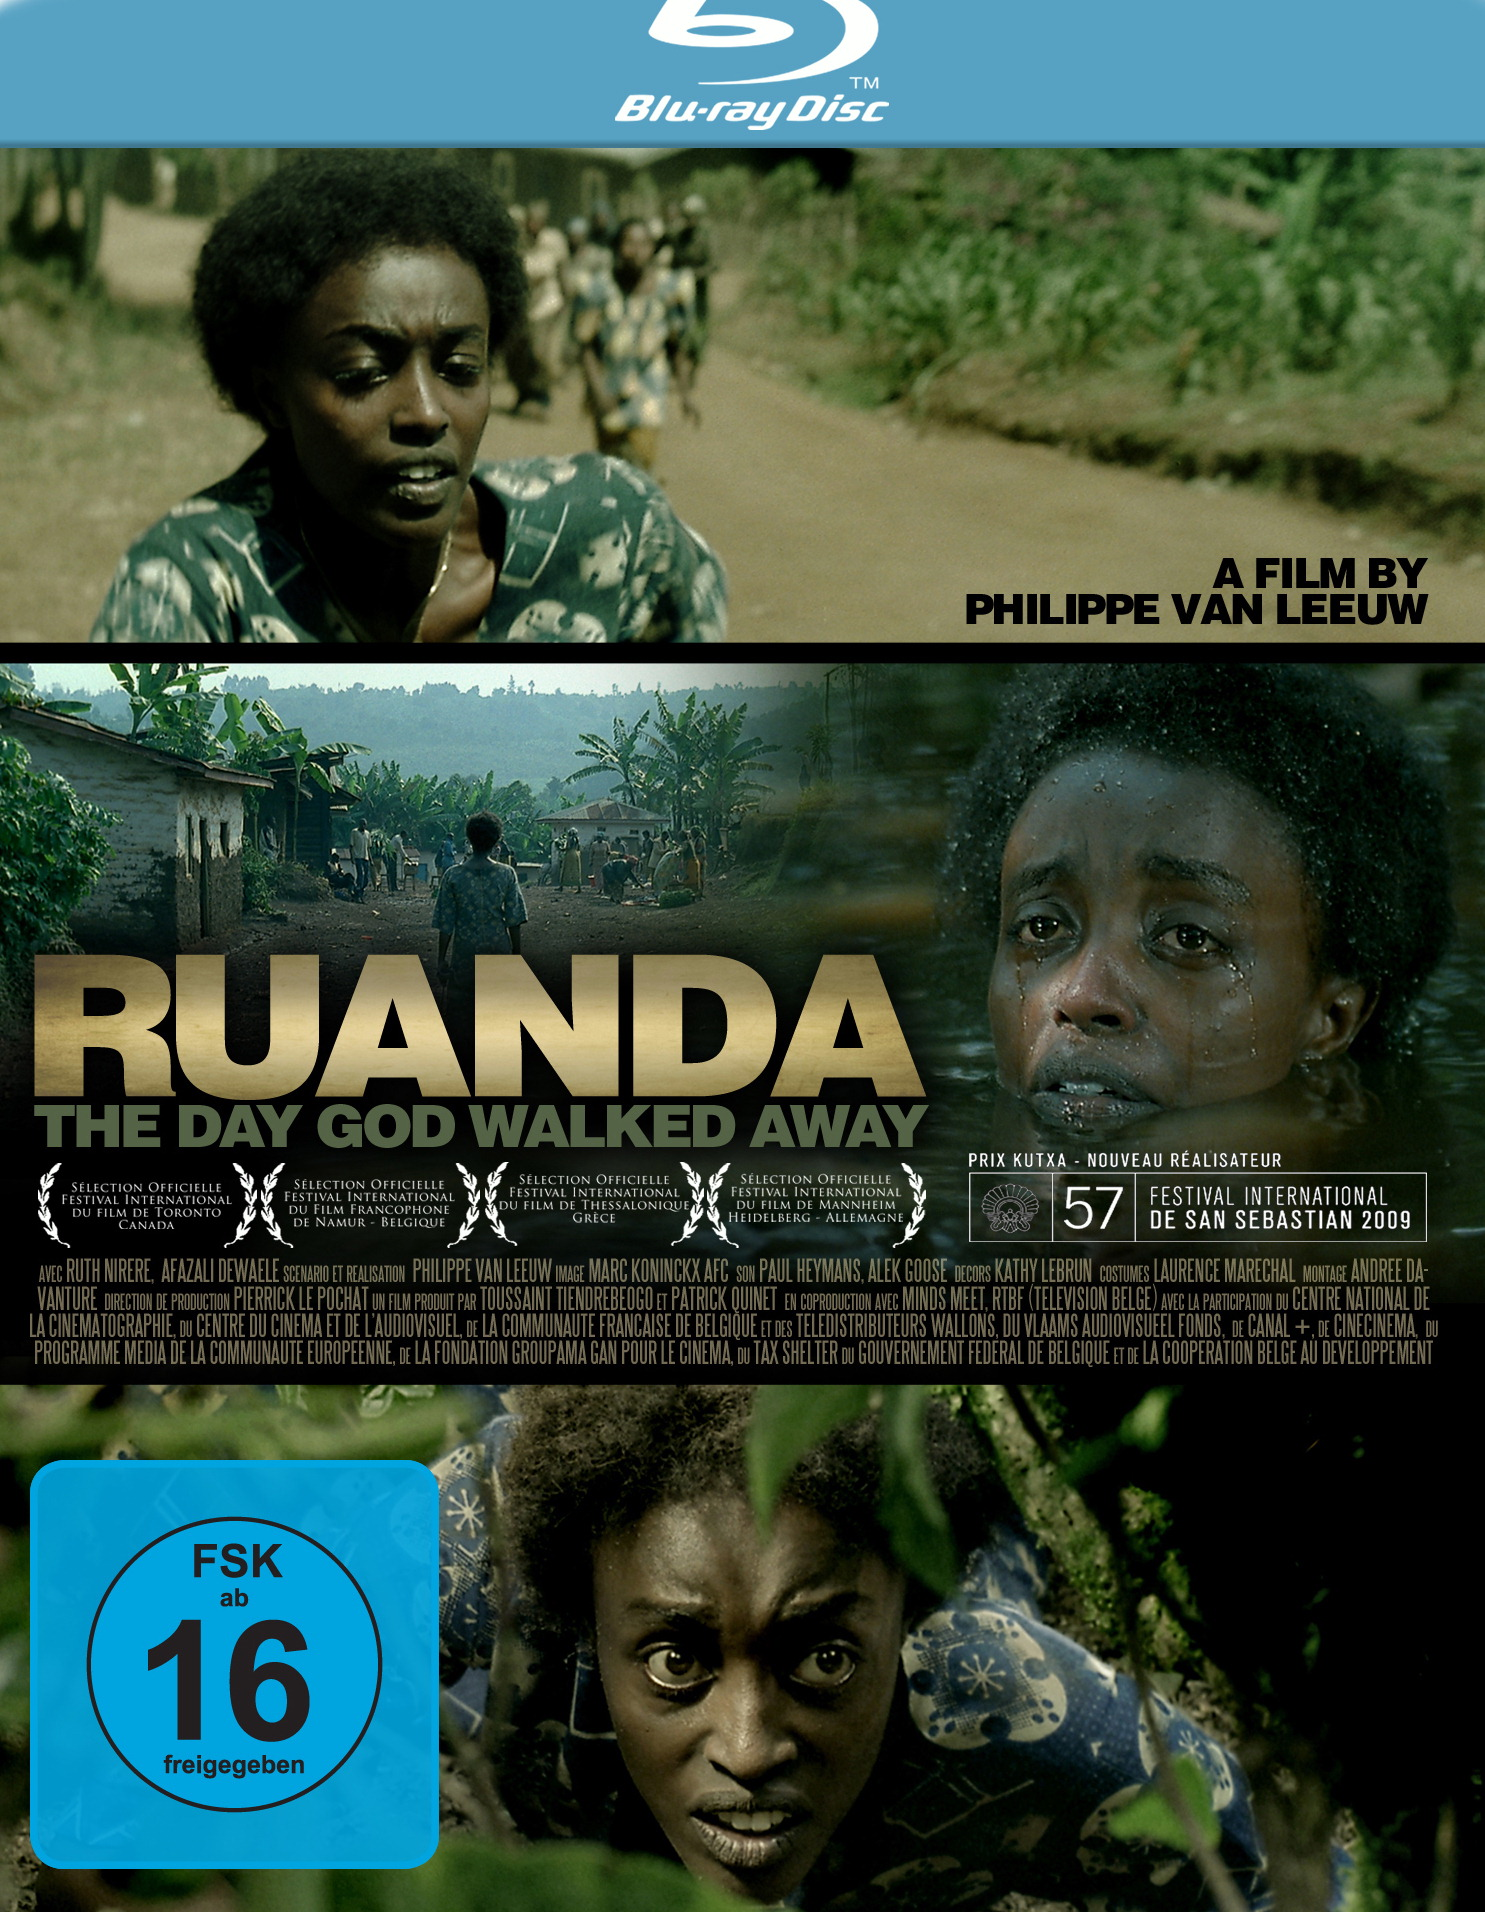 Ruanda - The Day God Walked Away Poster